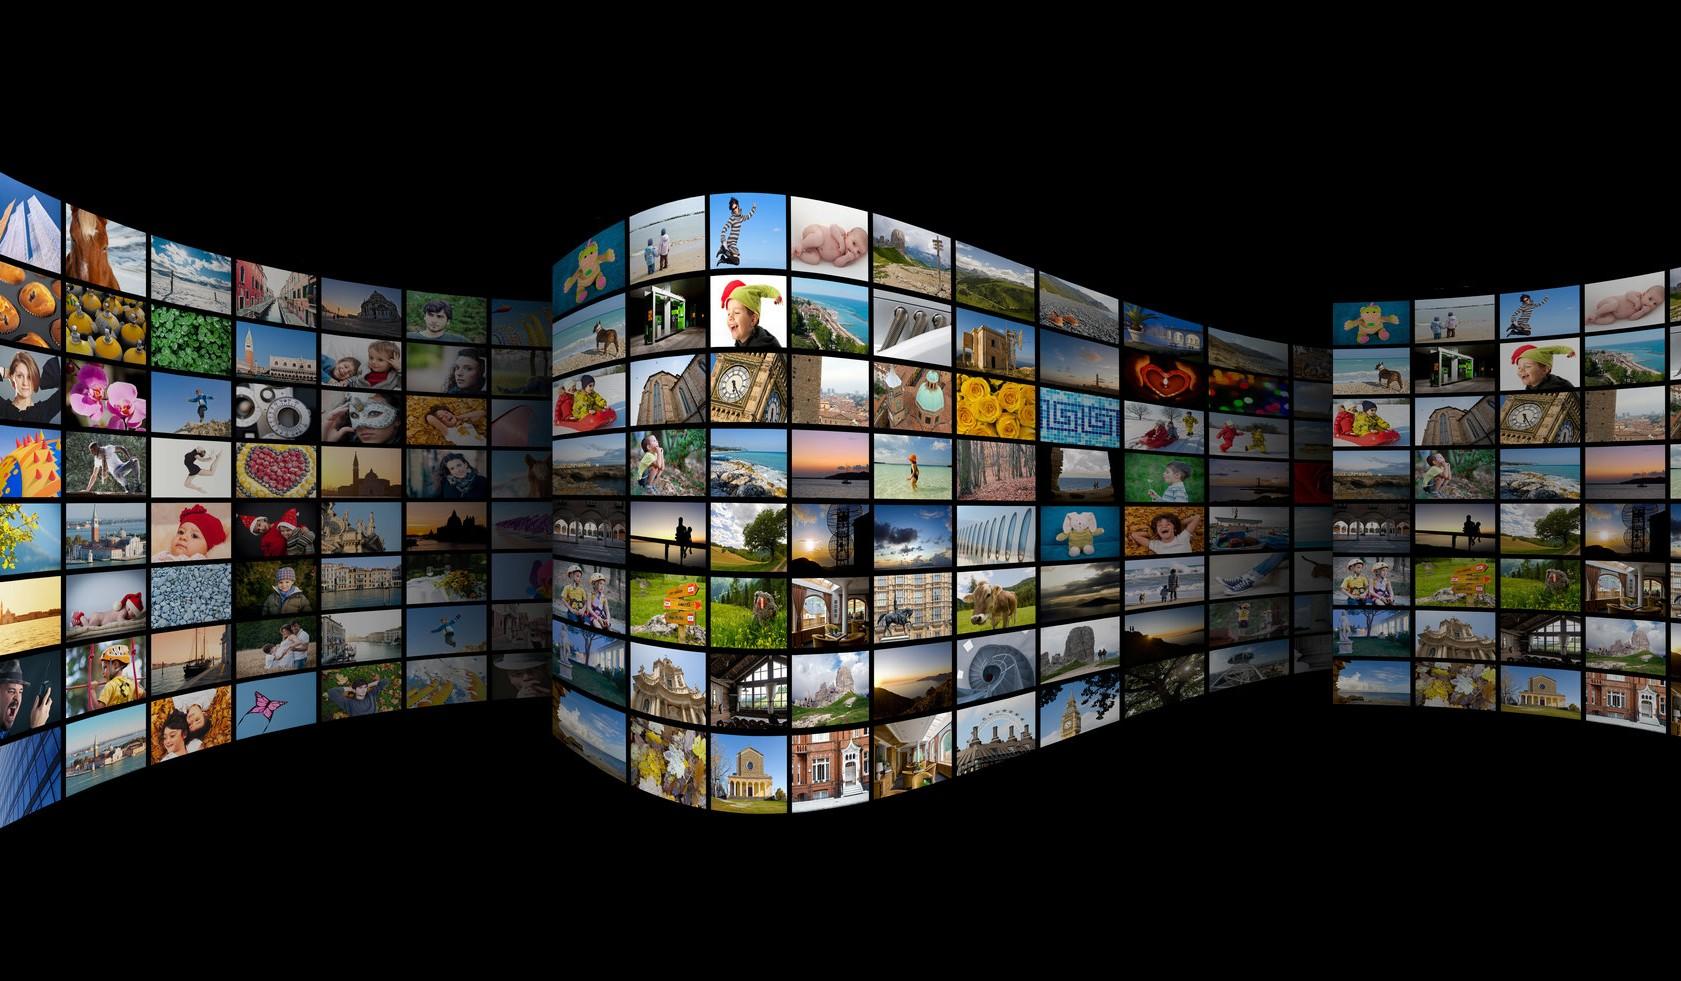 Stream Hd Tv